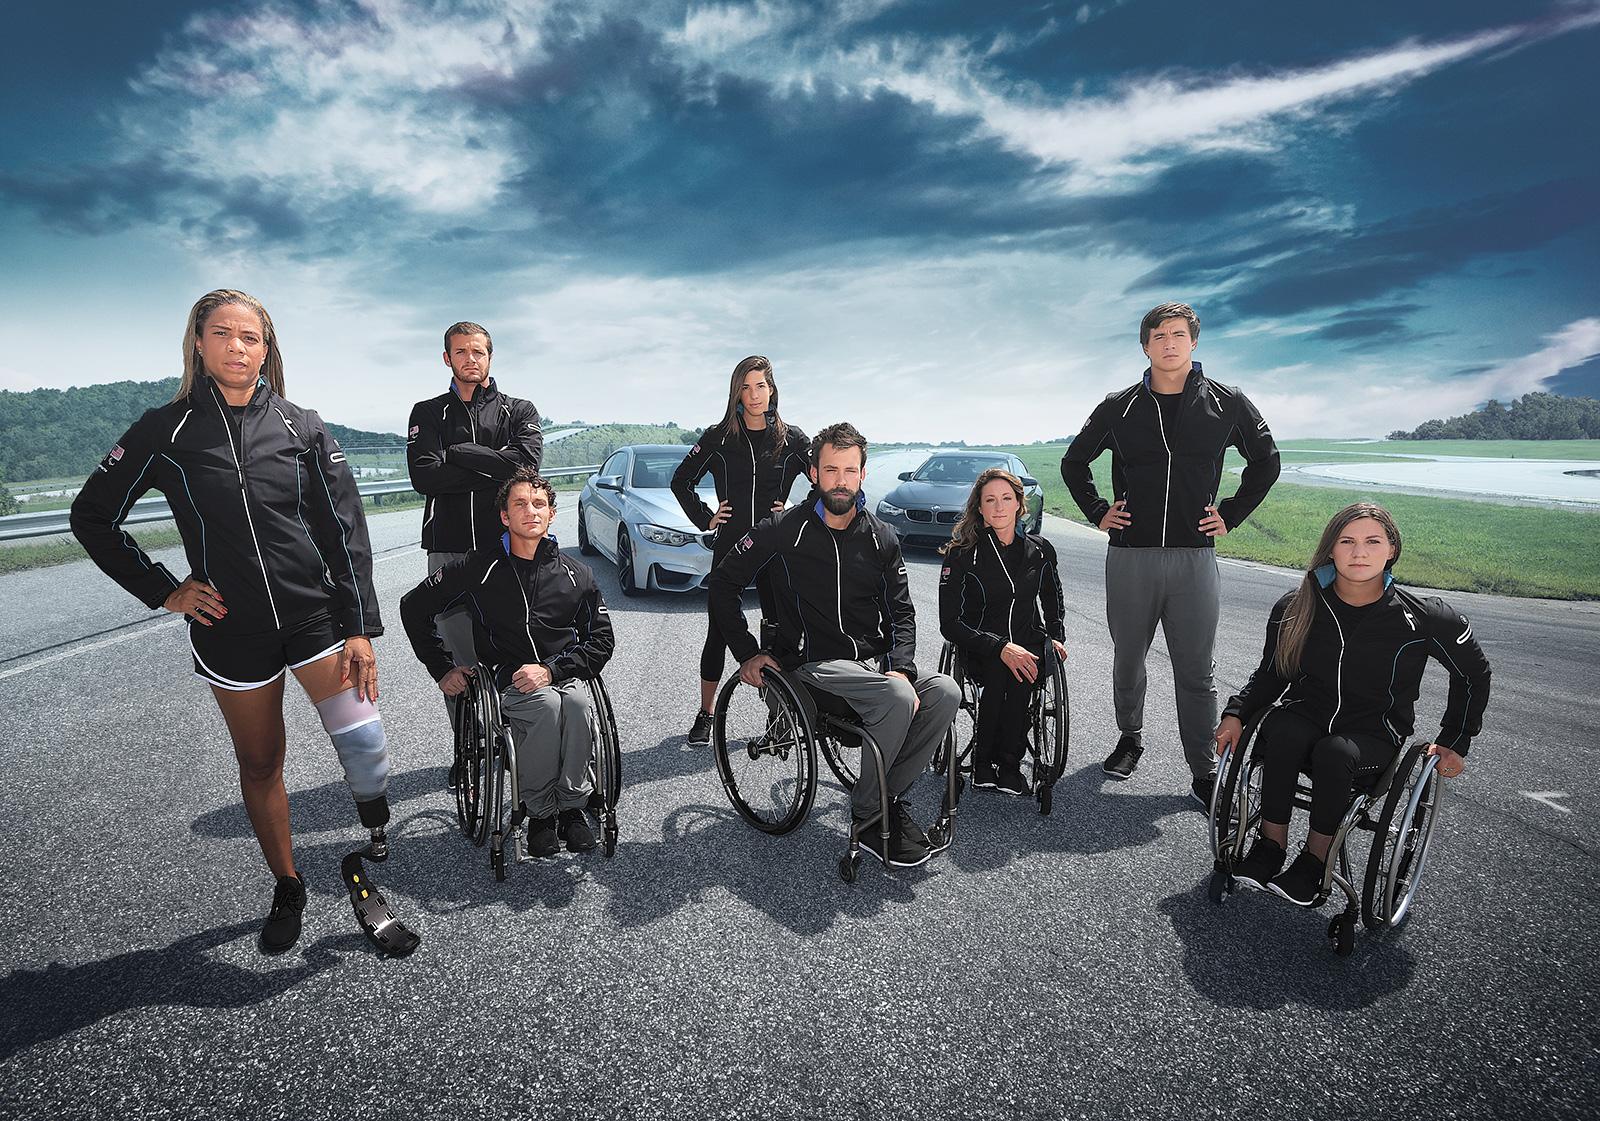 bmw olympics team 2016